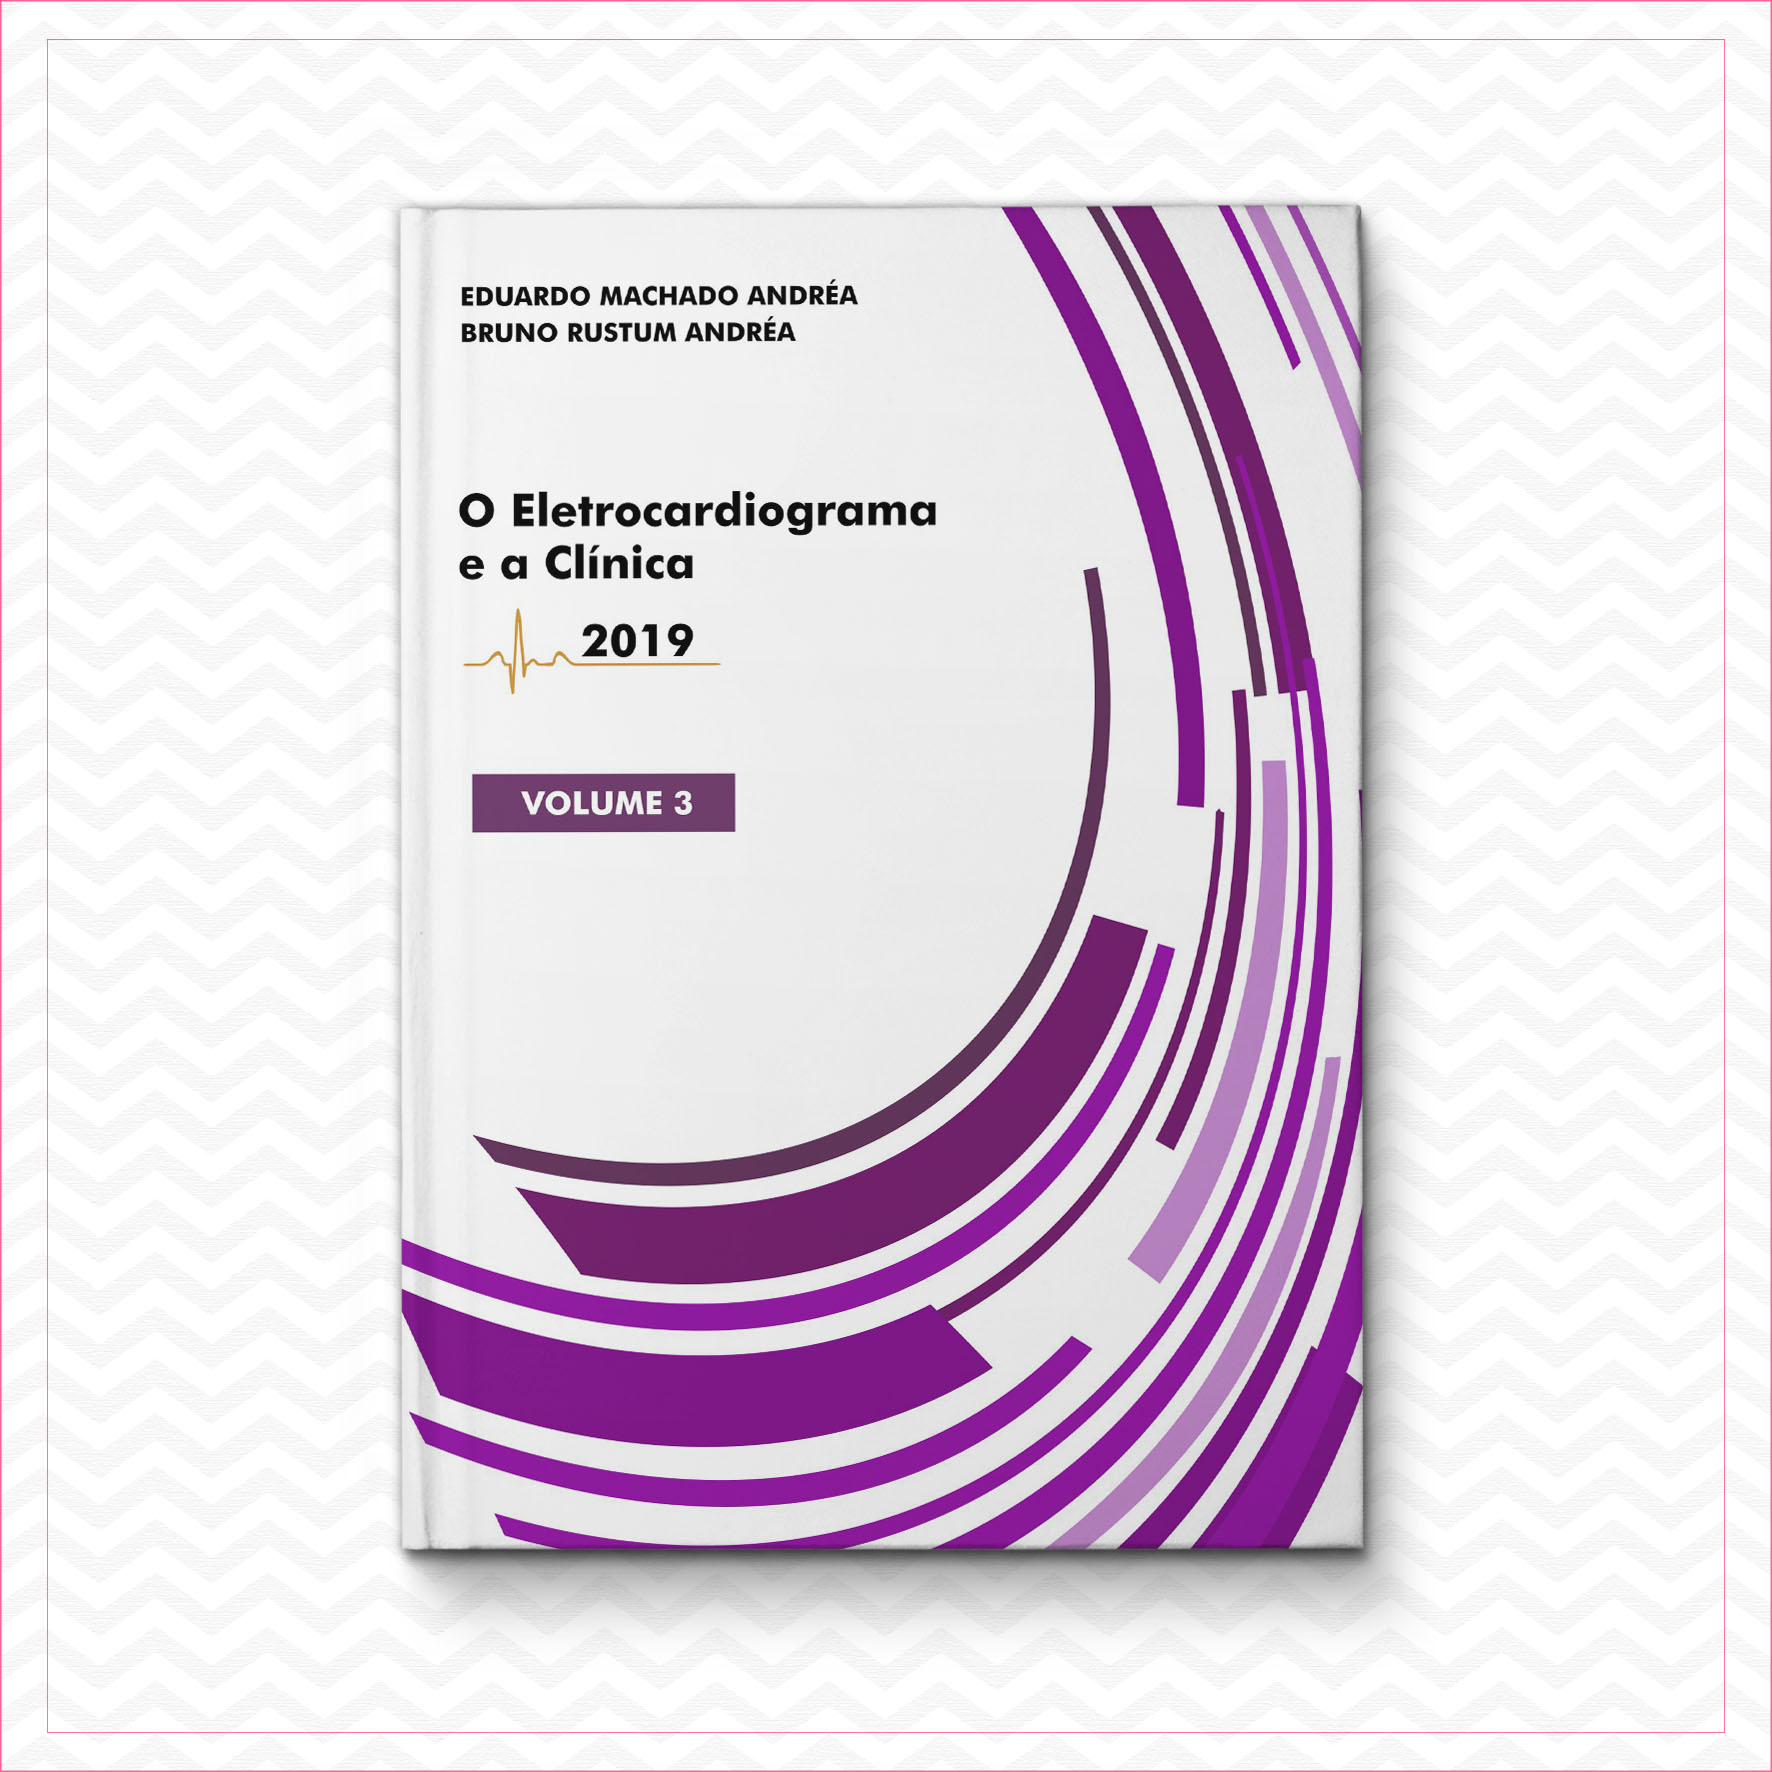 O eletrocardiograma e a clínica 3 – Eduardo Machado Andréa & Bruno Rustum Andréa